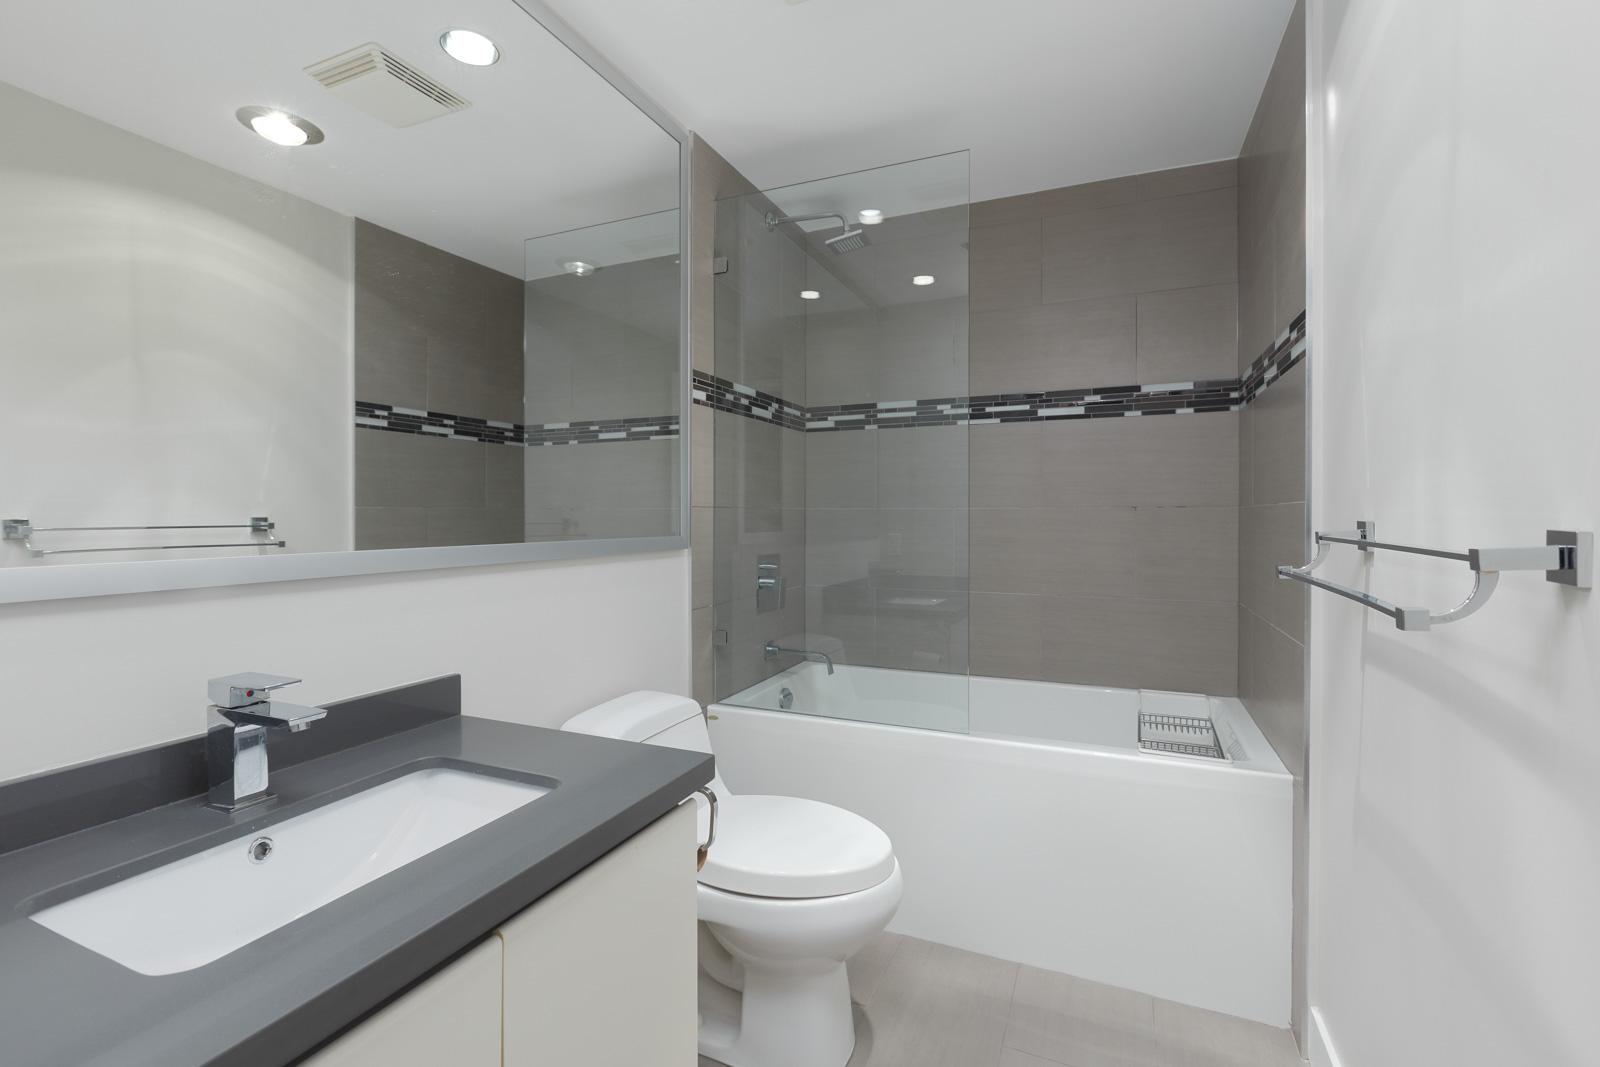 bathroom with big windows and white tub